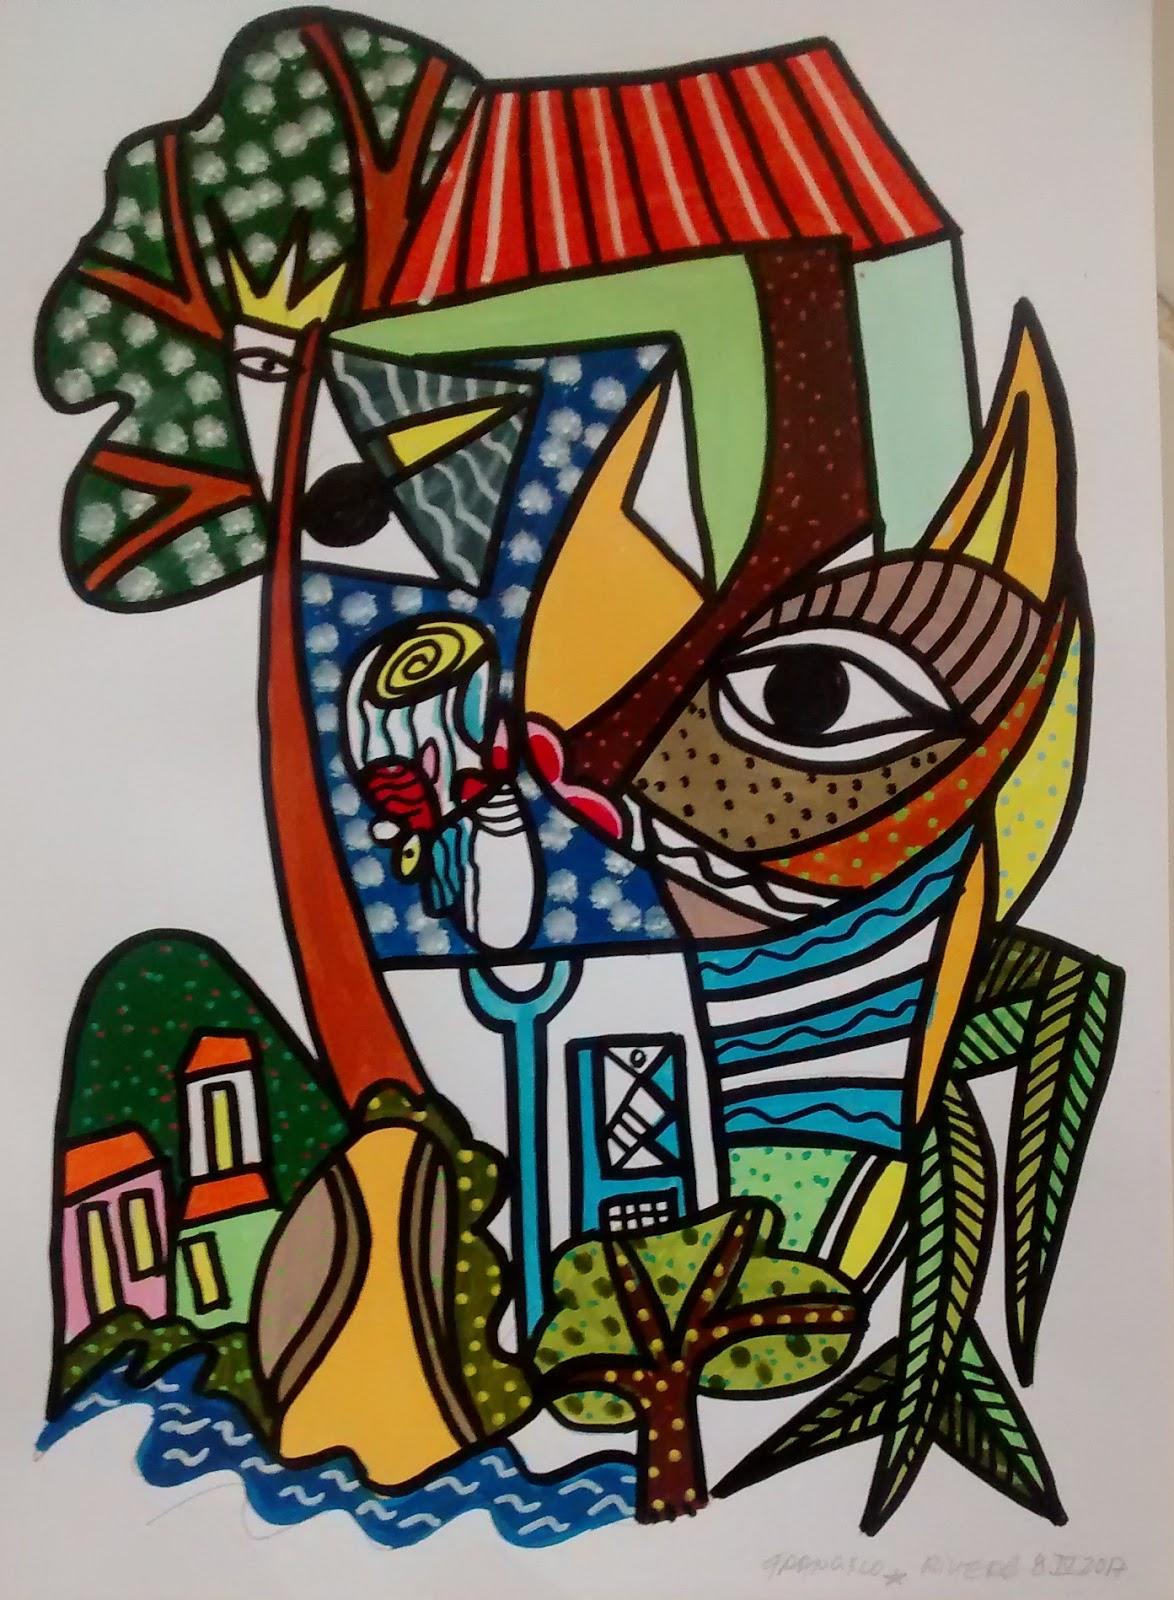 Blog du peintre francisco rivero el espiritud del tiempo for Nouvelle peinture murale